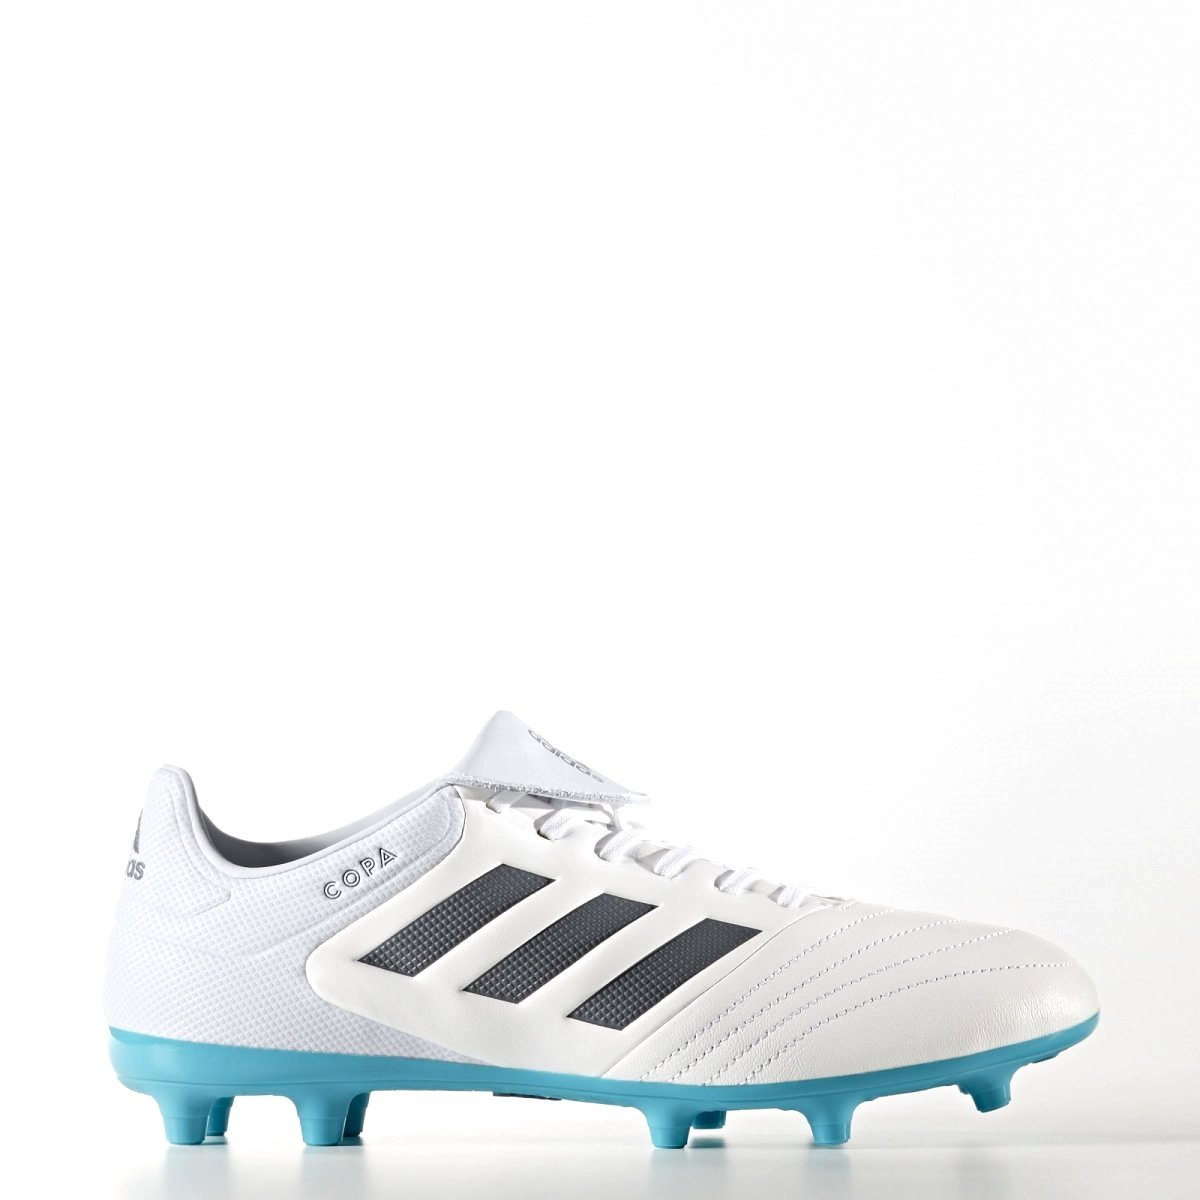 057d18f69f83f Chuteira Campo Adidas Copa 17.3 FG S77141 Branco Turquesa